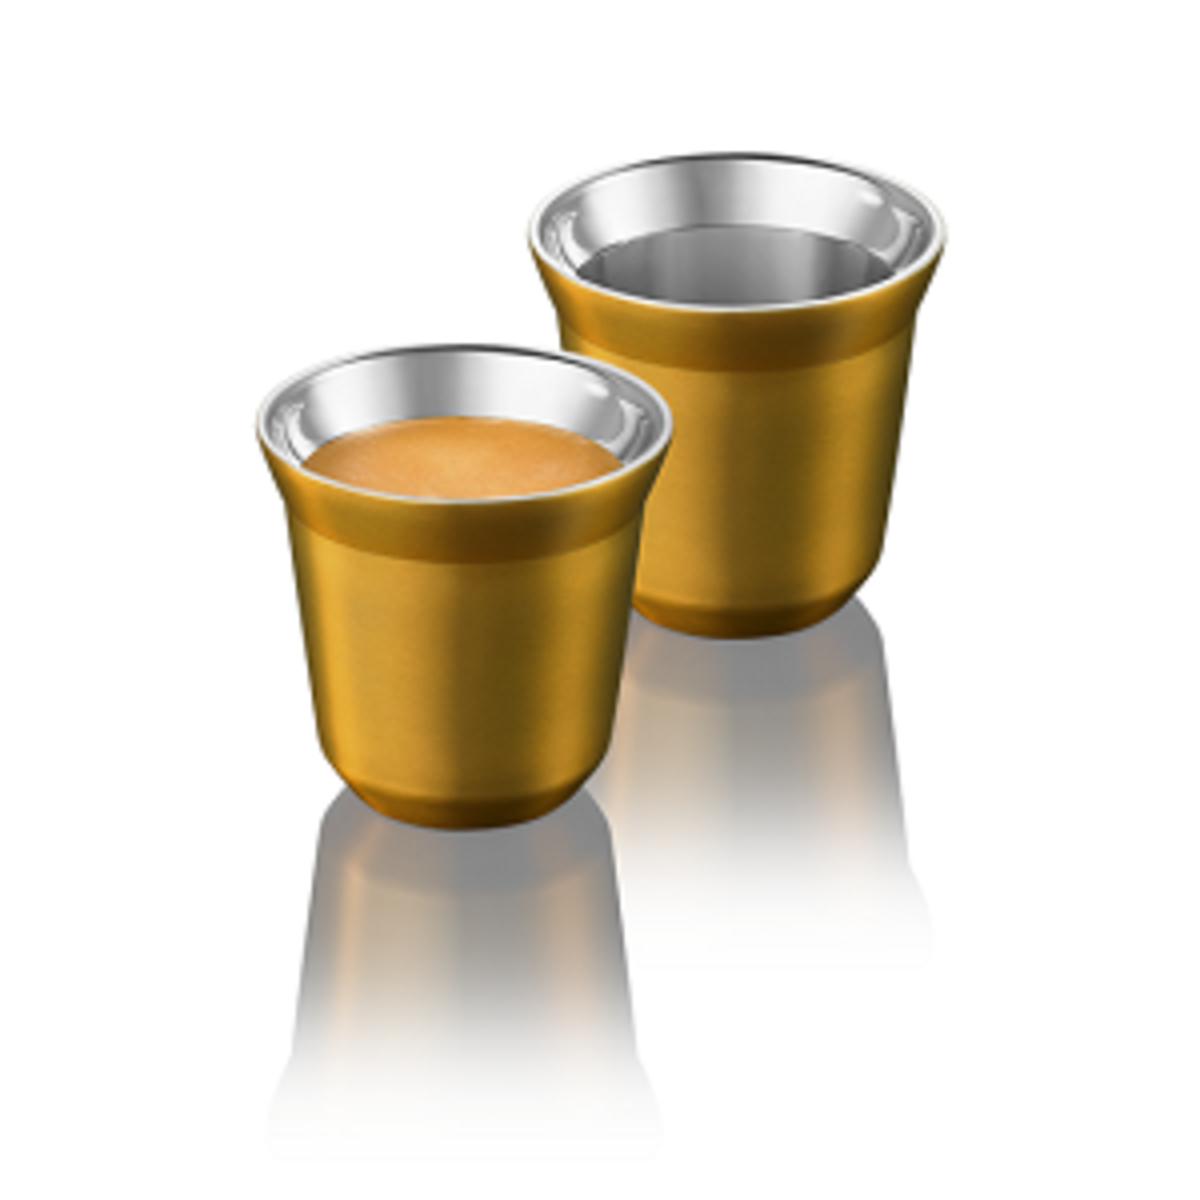 Nespresso чаши Pixie Espresso Volluto